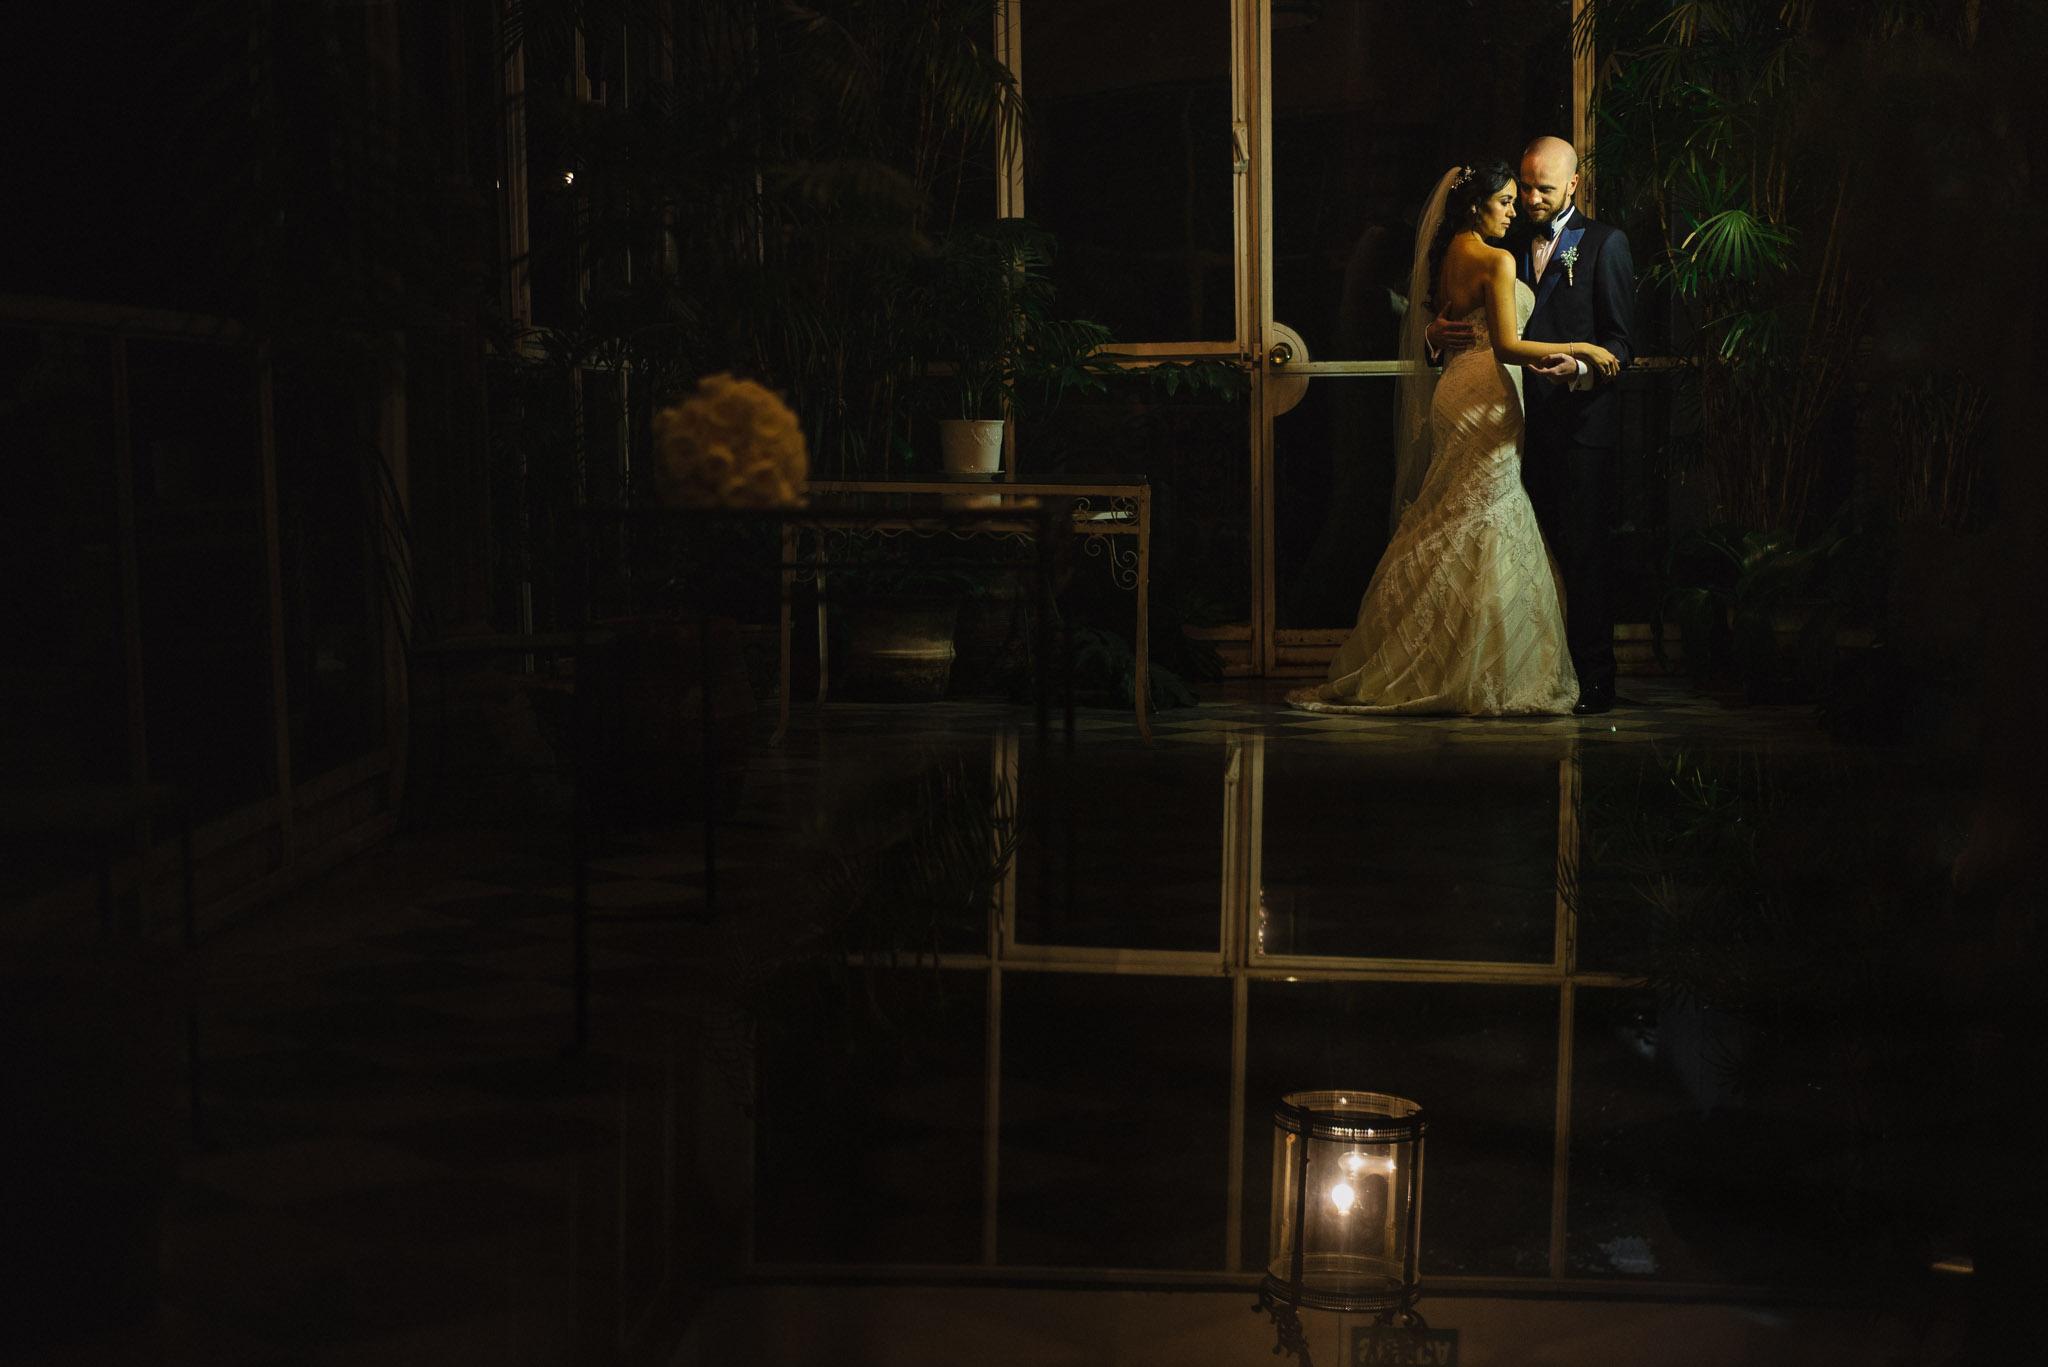 ©www.mauriziosolisbroca.com-20161001maurizio-solis-broca-mexico-canada-wedding-photographer20161001DSC05162-Edit-Edit.jpg